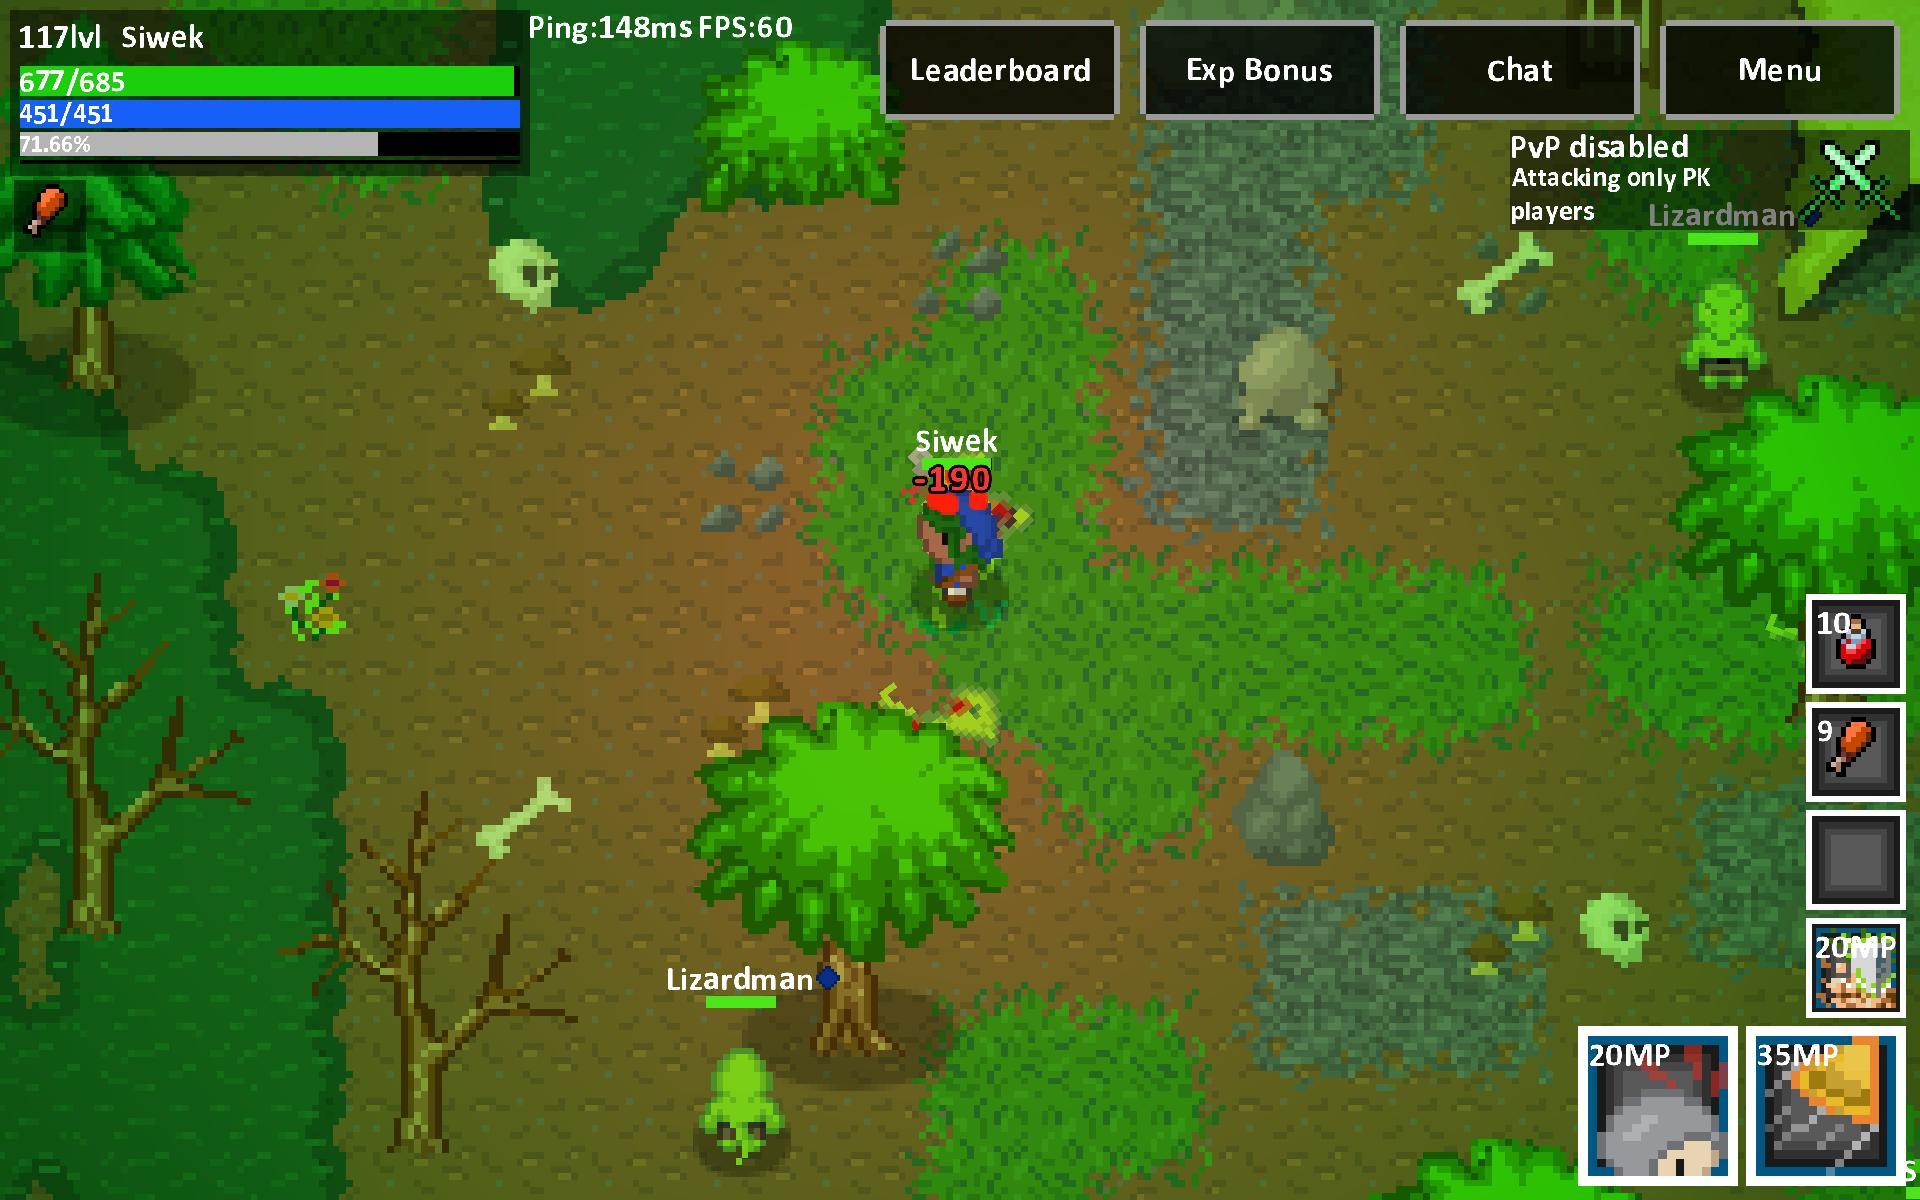 Heroes & Rats MMORPG Online 0.32.2 Screenshot 19